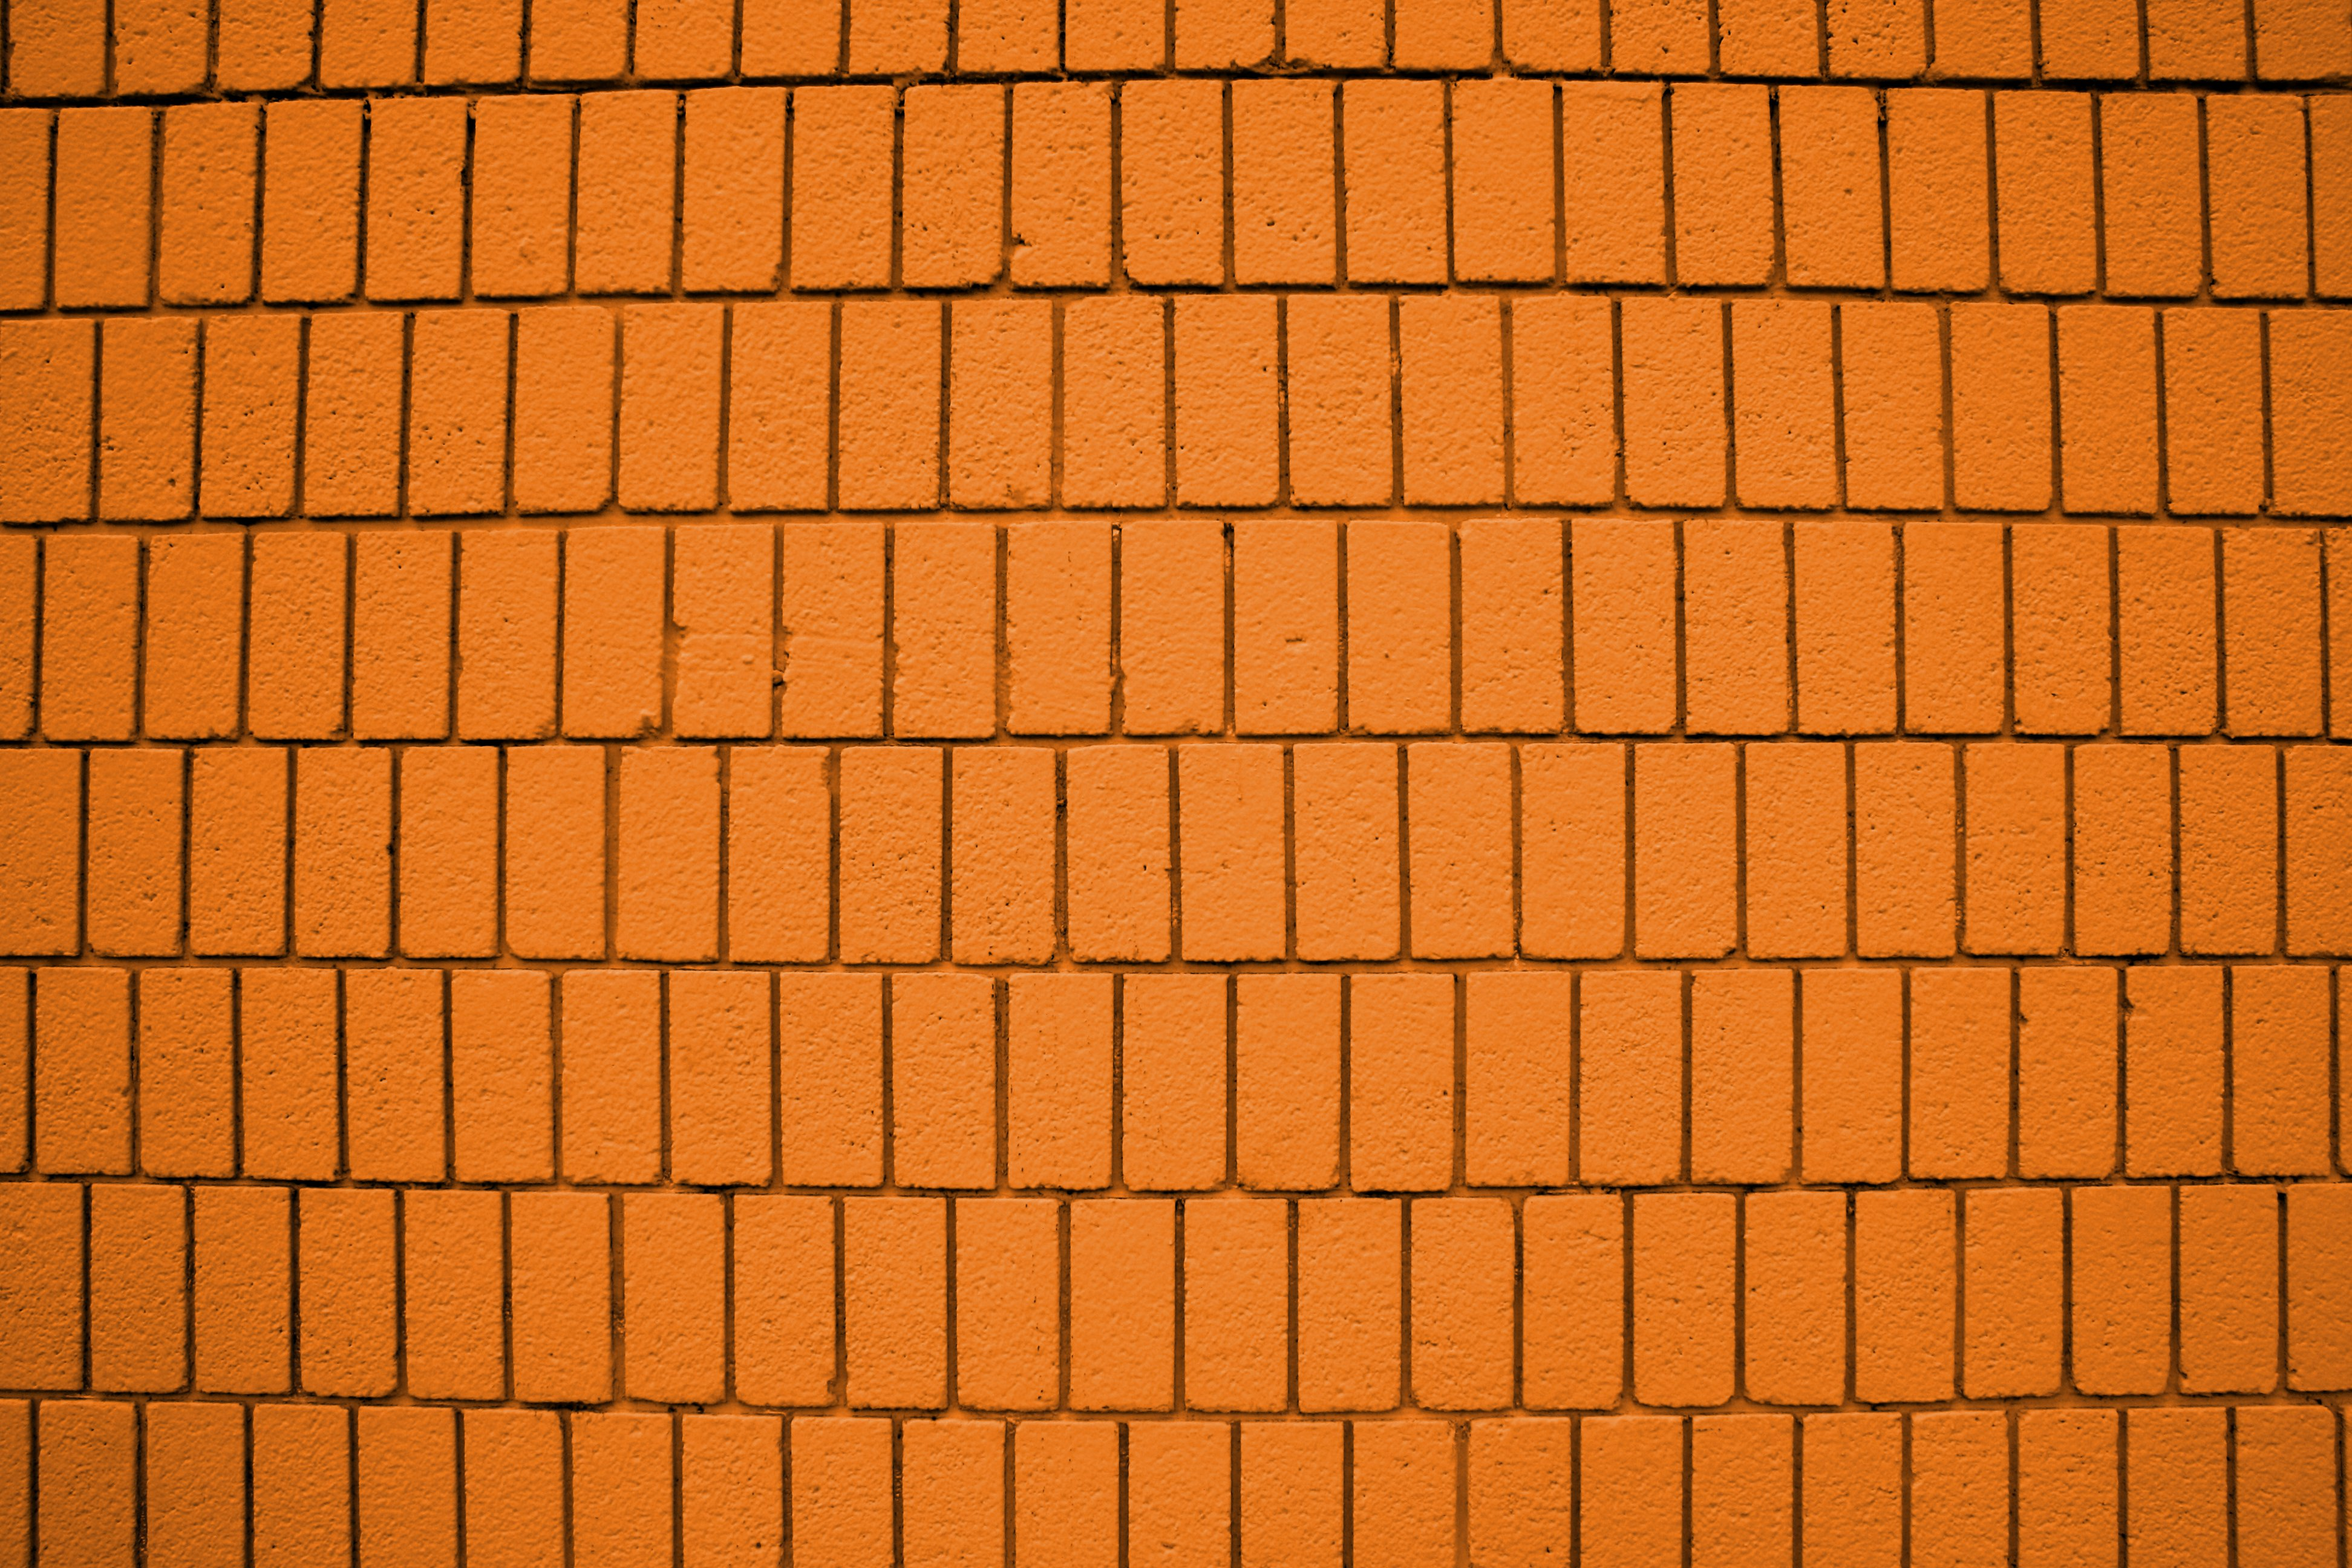 Bright Orange Brick Wall Texture with Vertical Bricks Picture | Free ...